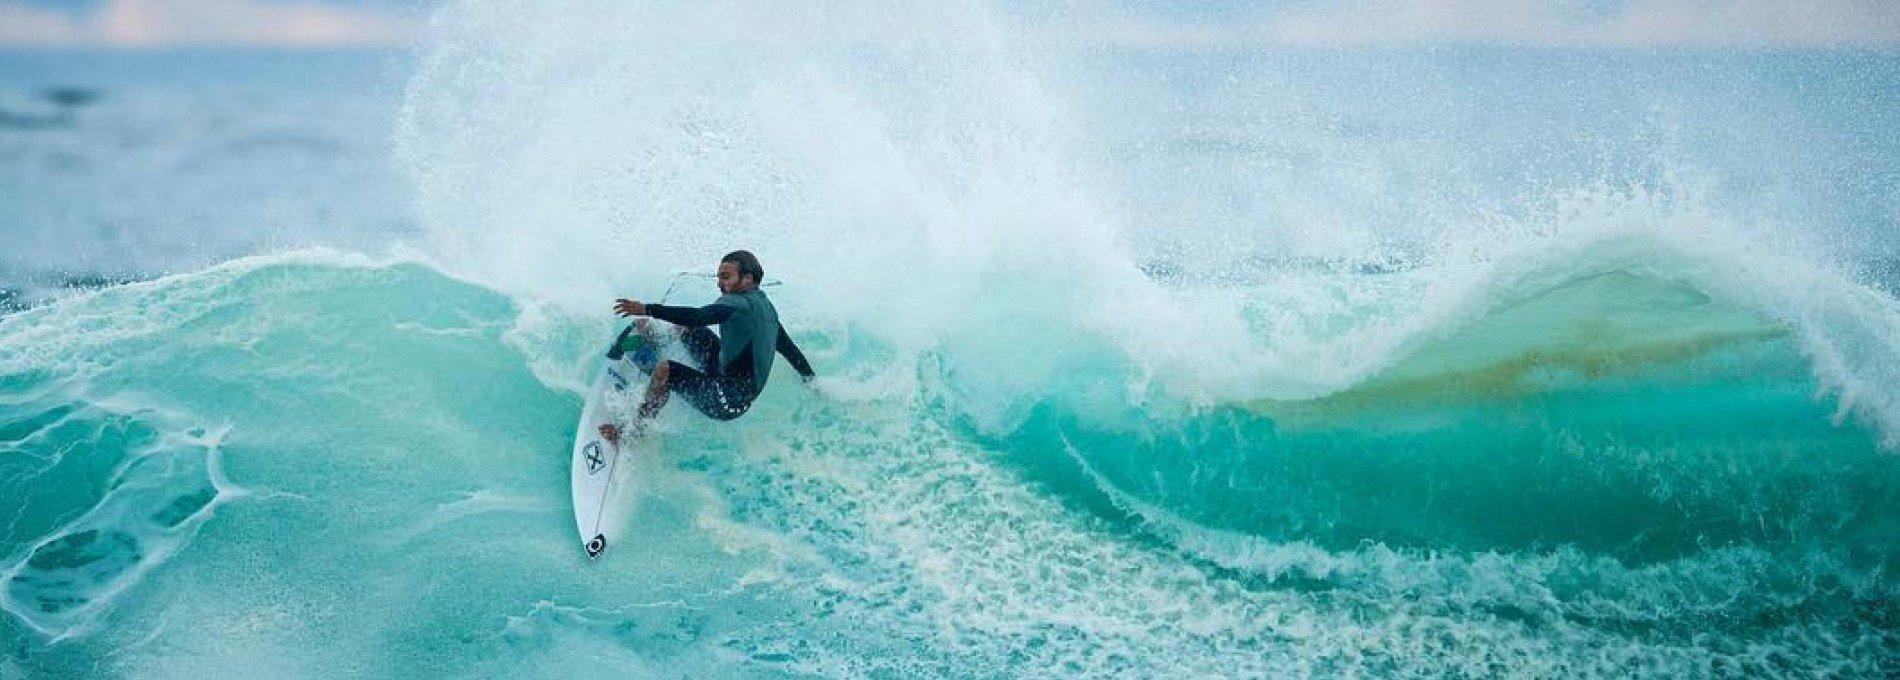 surfista-caio-ibelli